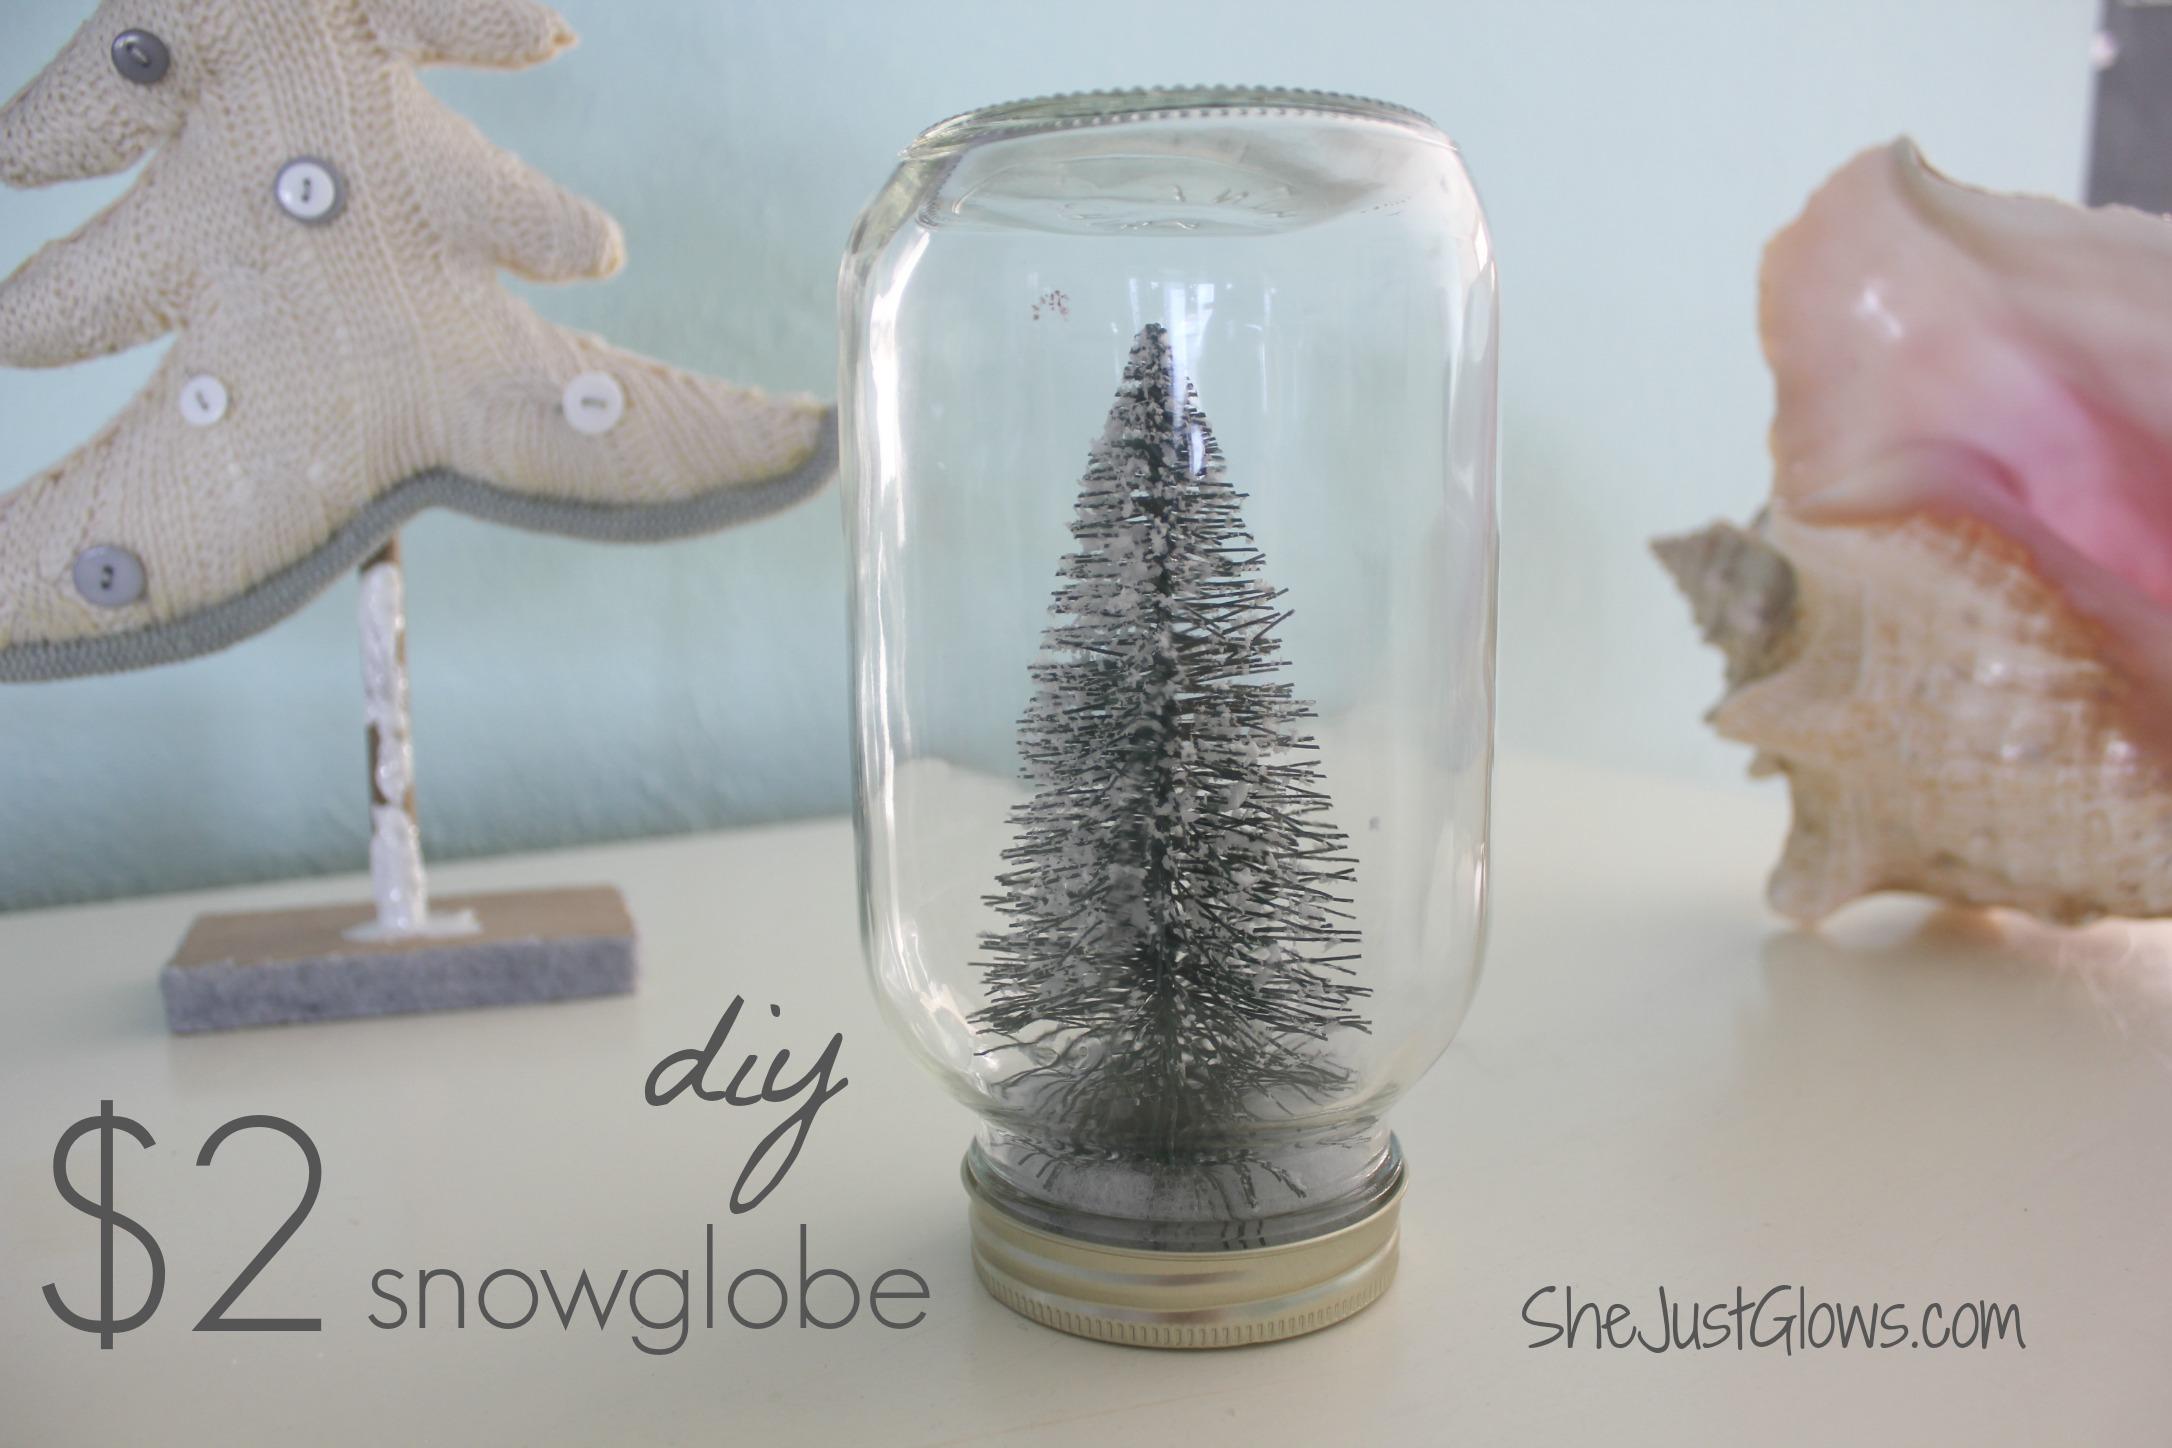 DIY $2 Snowglobe SheJustGlows.com